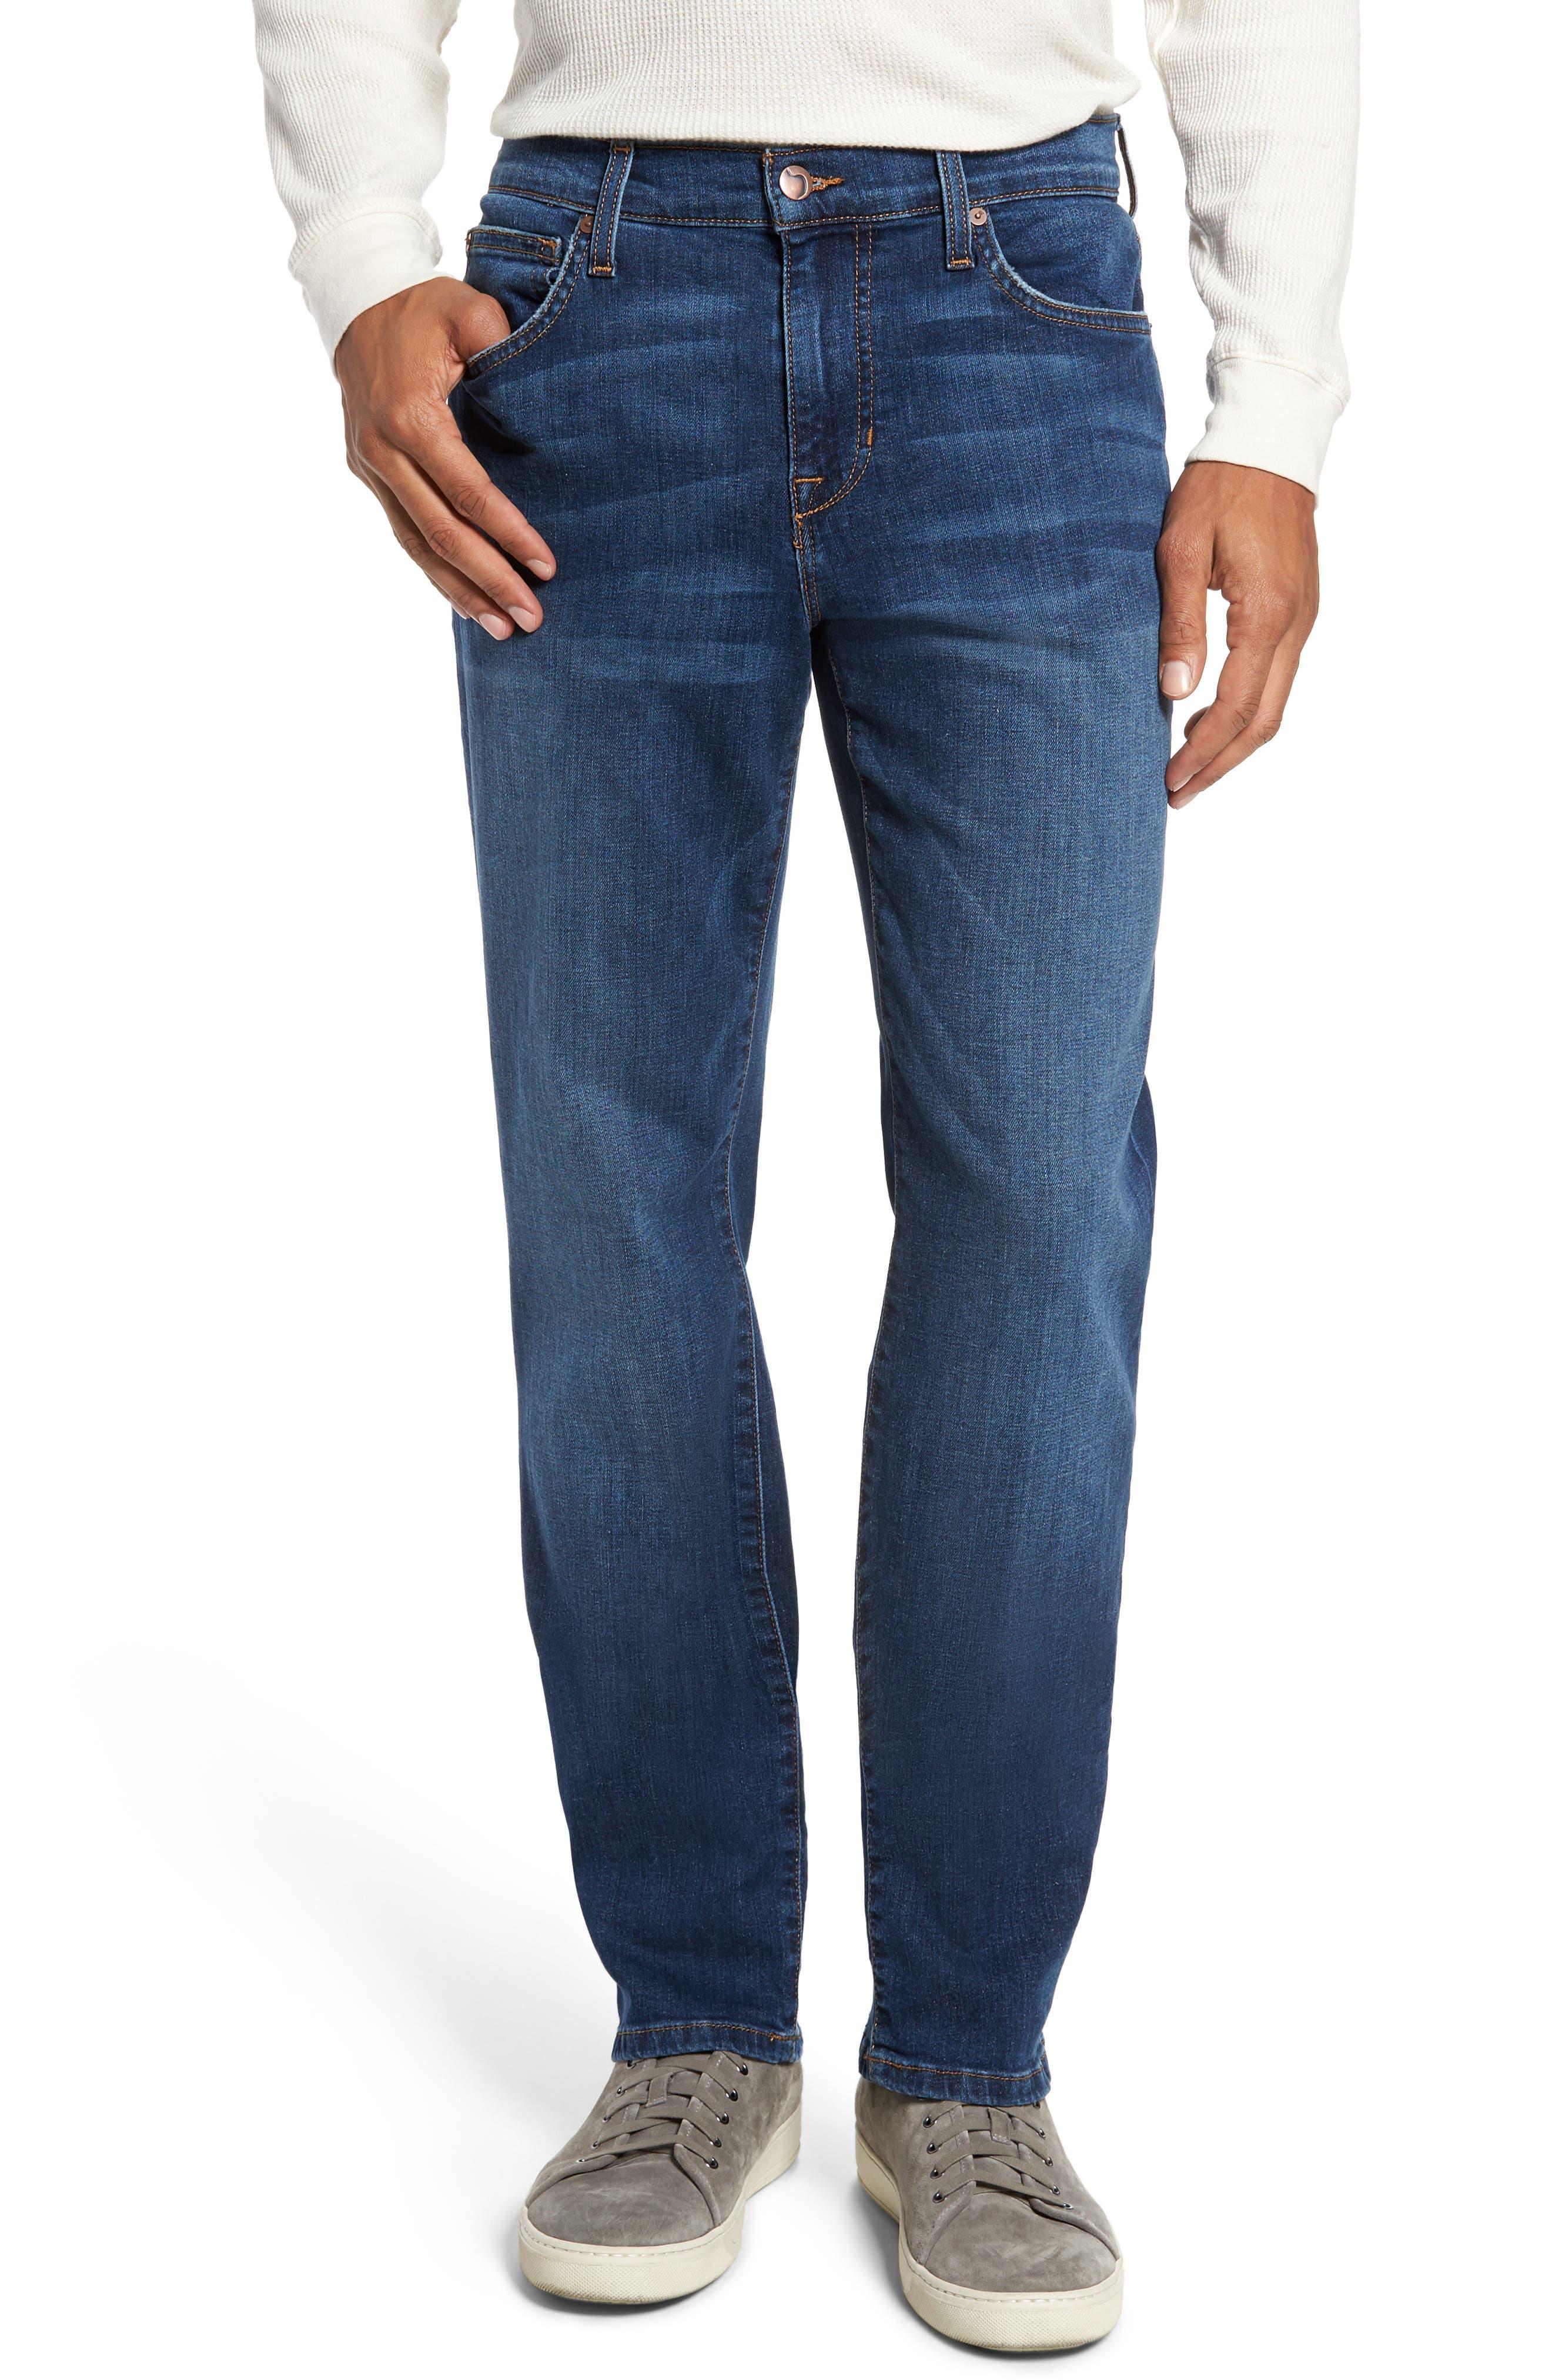 Brixton Slim Straight Leg Jeans,                         Main,                         color, Bradlee